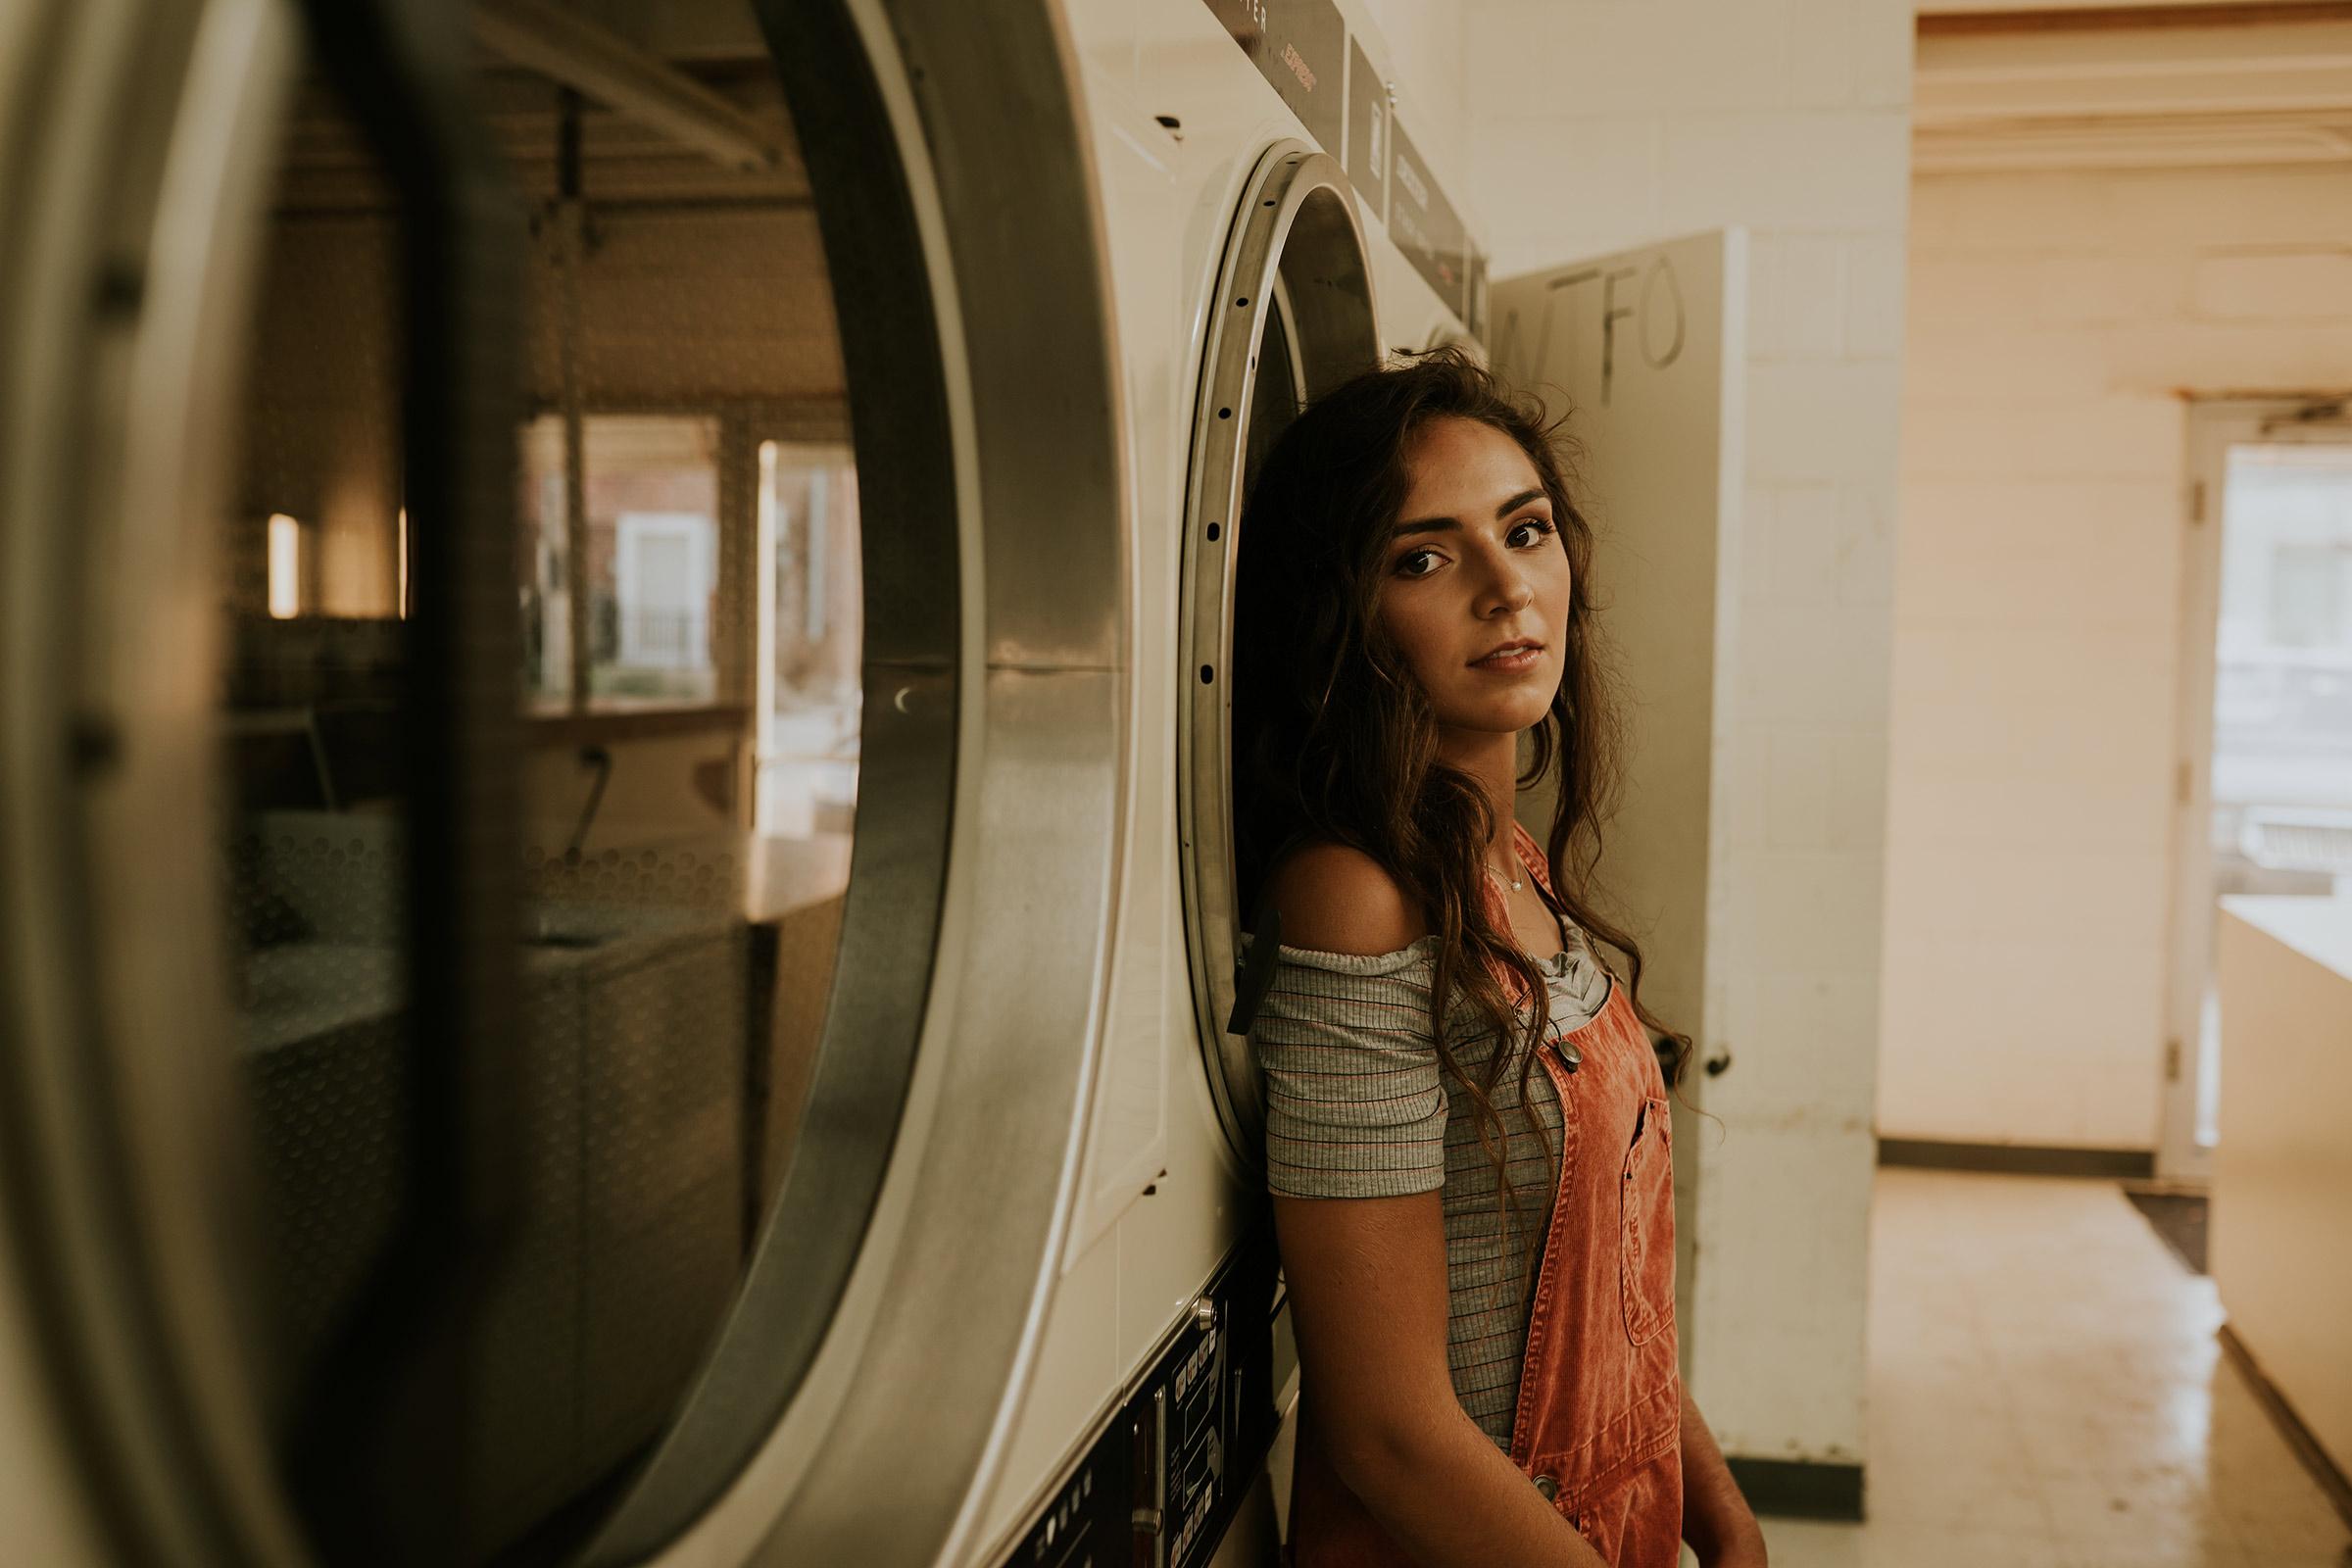 lizzy-senior-girl-at-laundromat-winterset-ankeny-high-school-desmoines-iowa-raelyn-ramey-photography-90.jpg